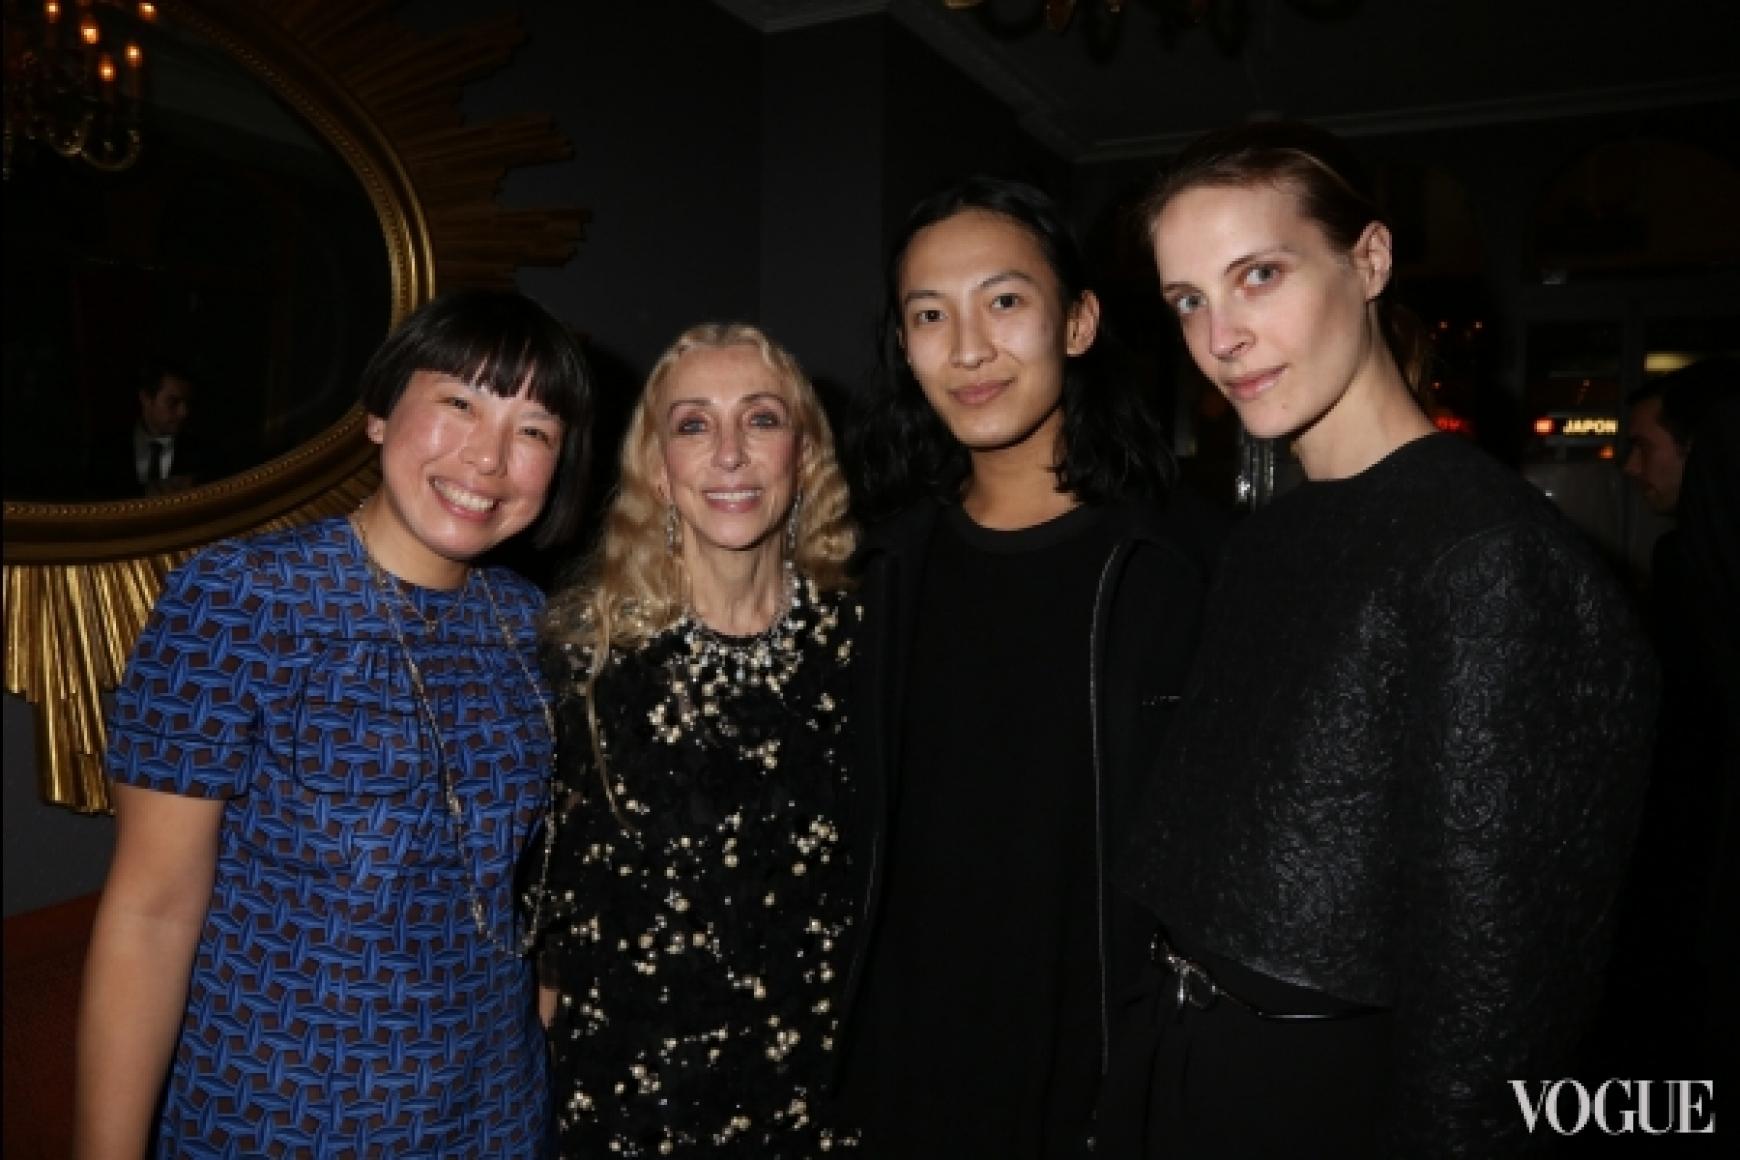 Анжелика Ченг (Vogue China), Франка Соццани (Vogue Italy), Александр Вэнг, Ванесса Траина